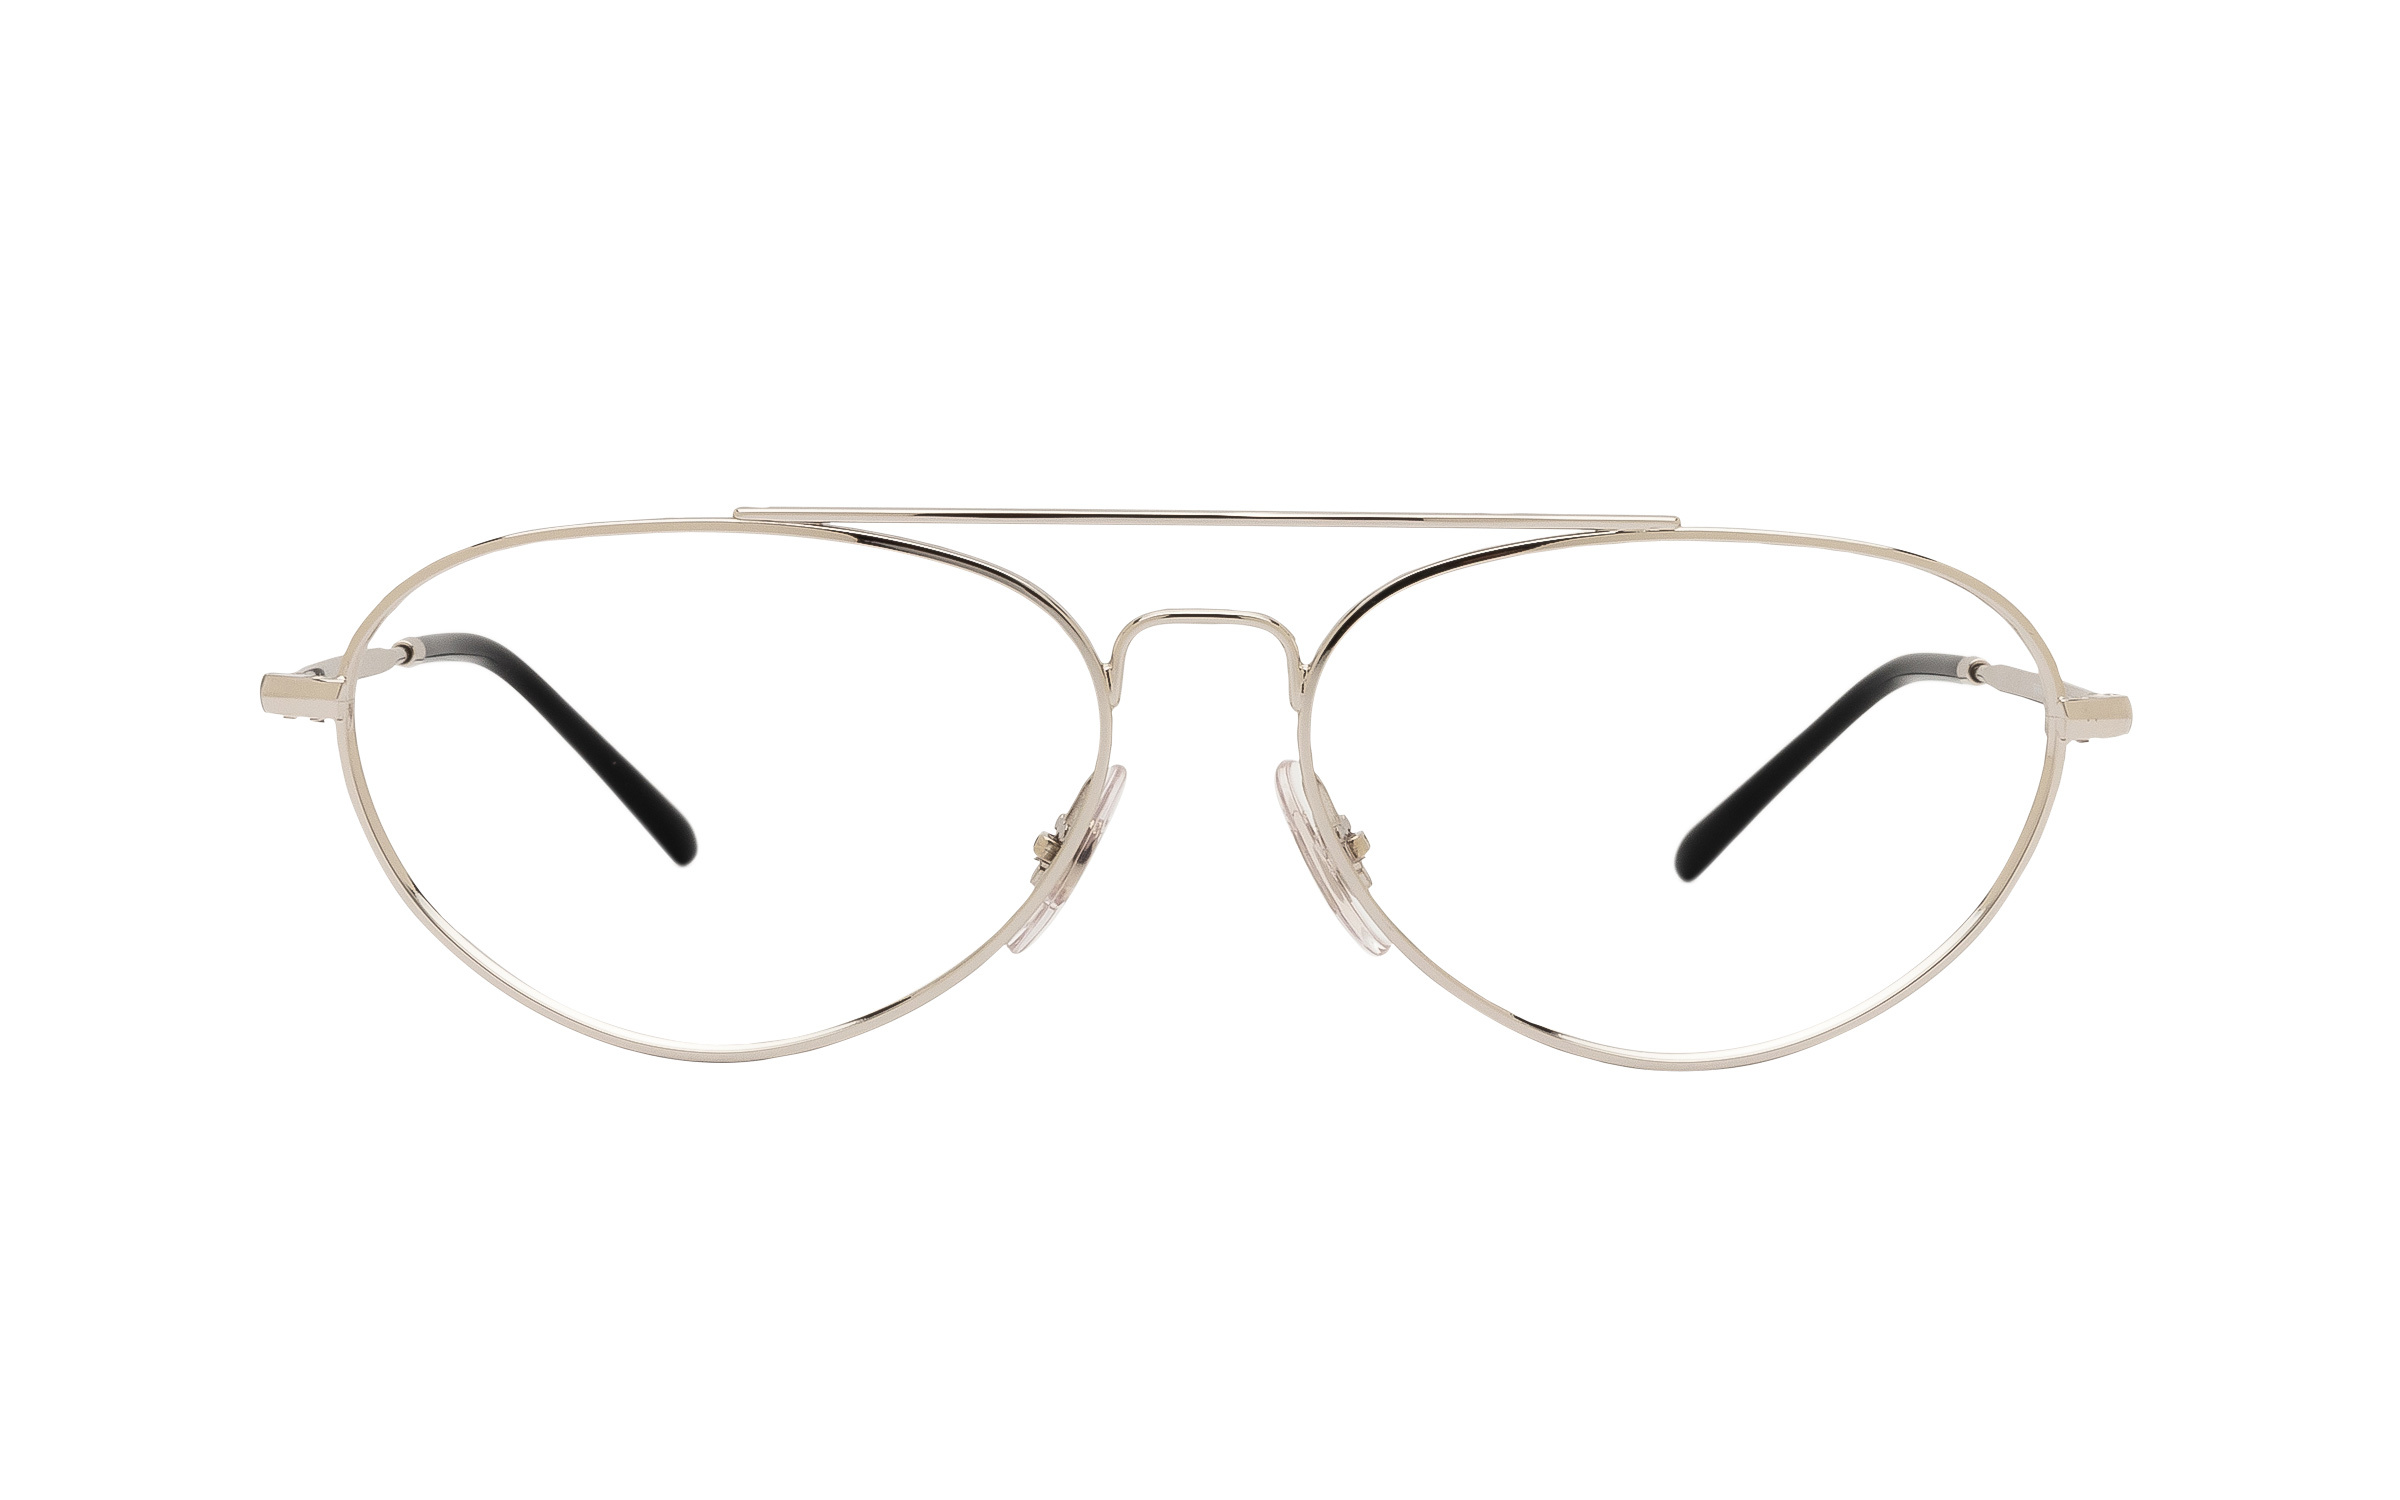 http://www.coastal.com/ - Ray-Ban RX6454 2501 (56) Eyeglasses and Frame in Silver – Online Coastal